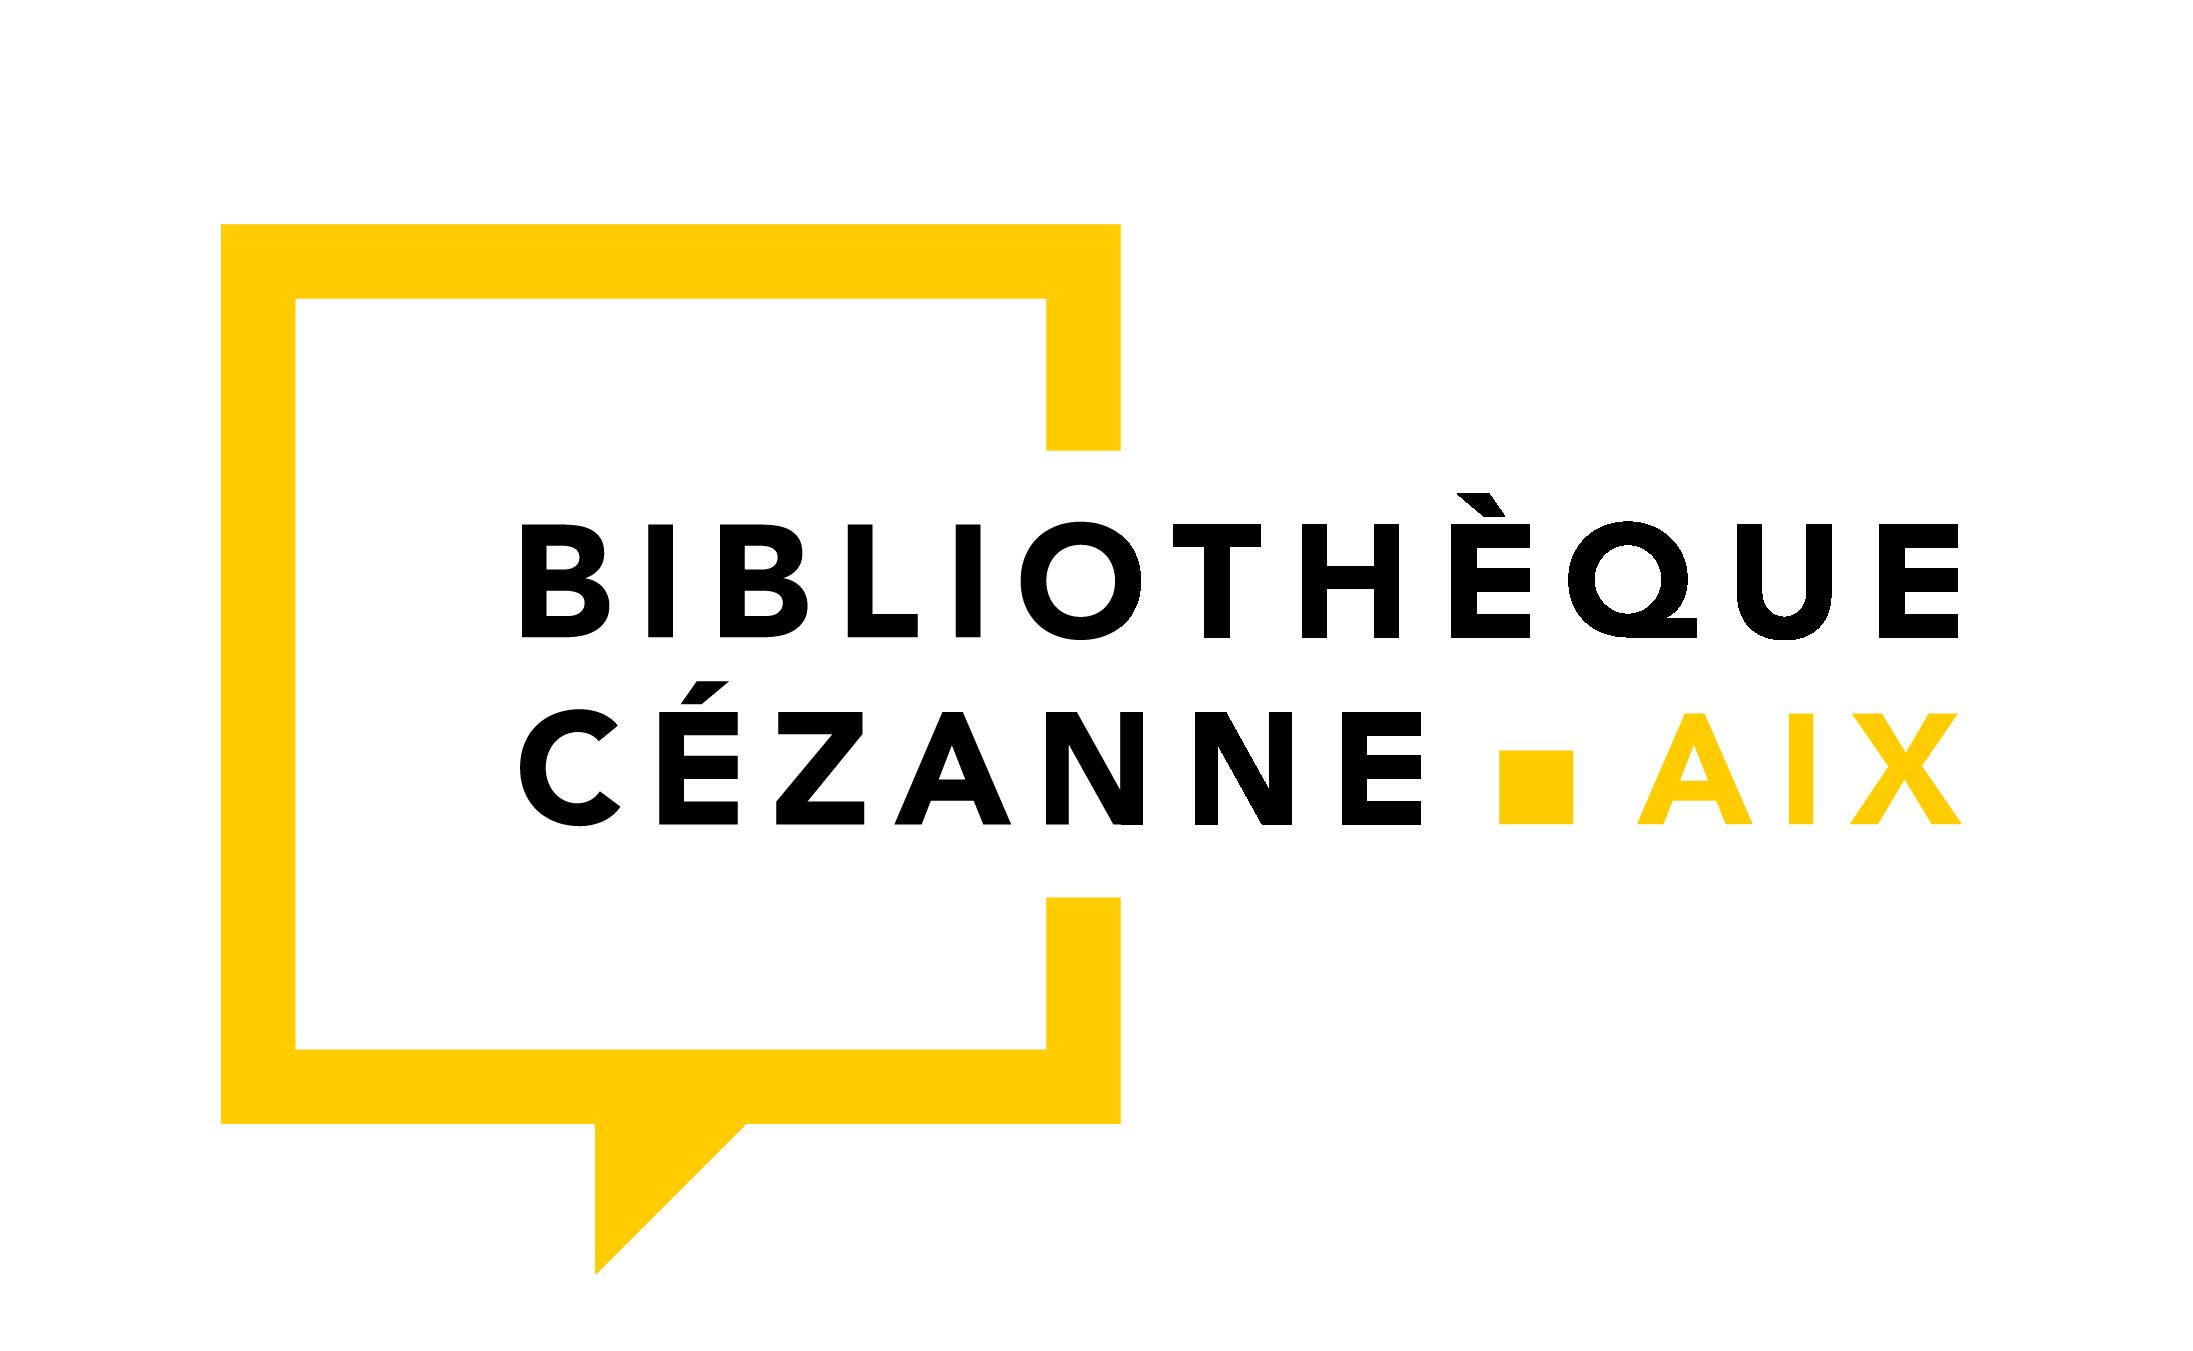 Bibliotheque-logo-RVB-01